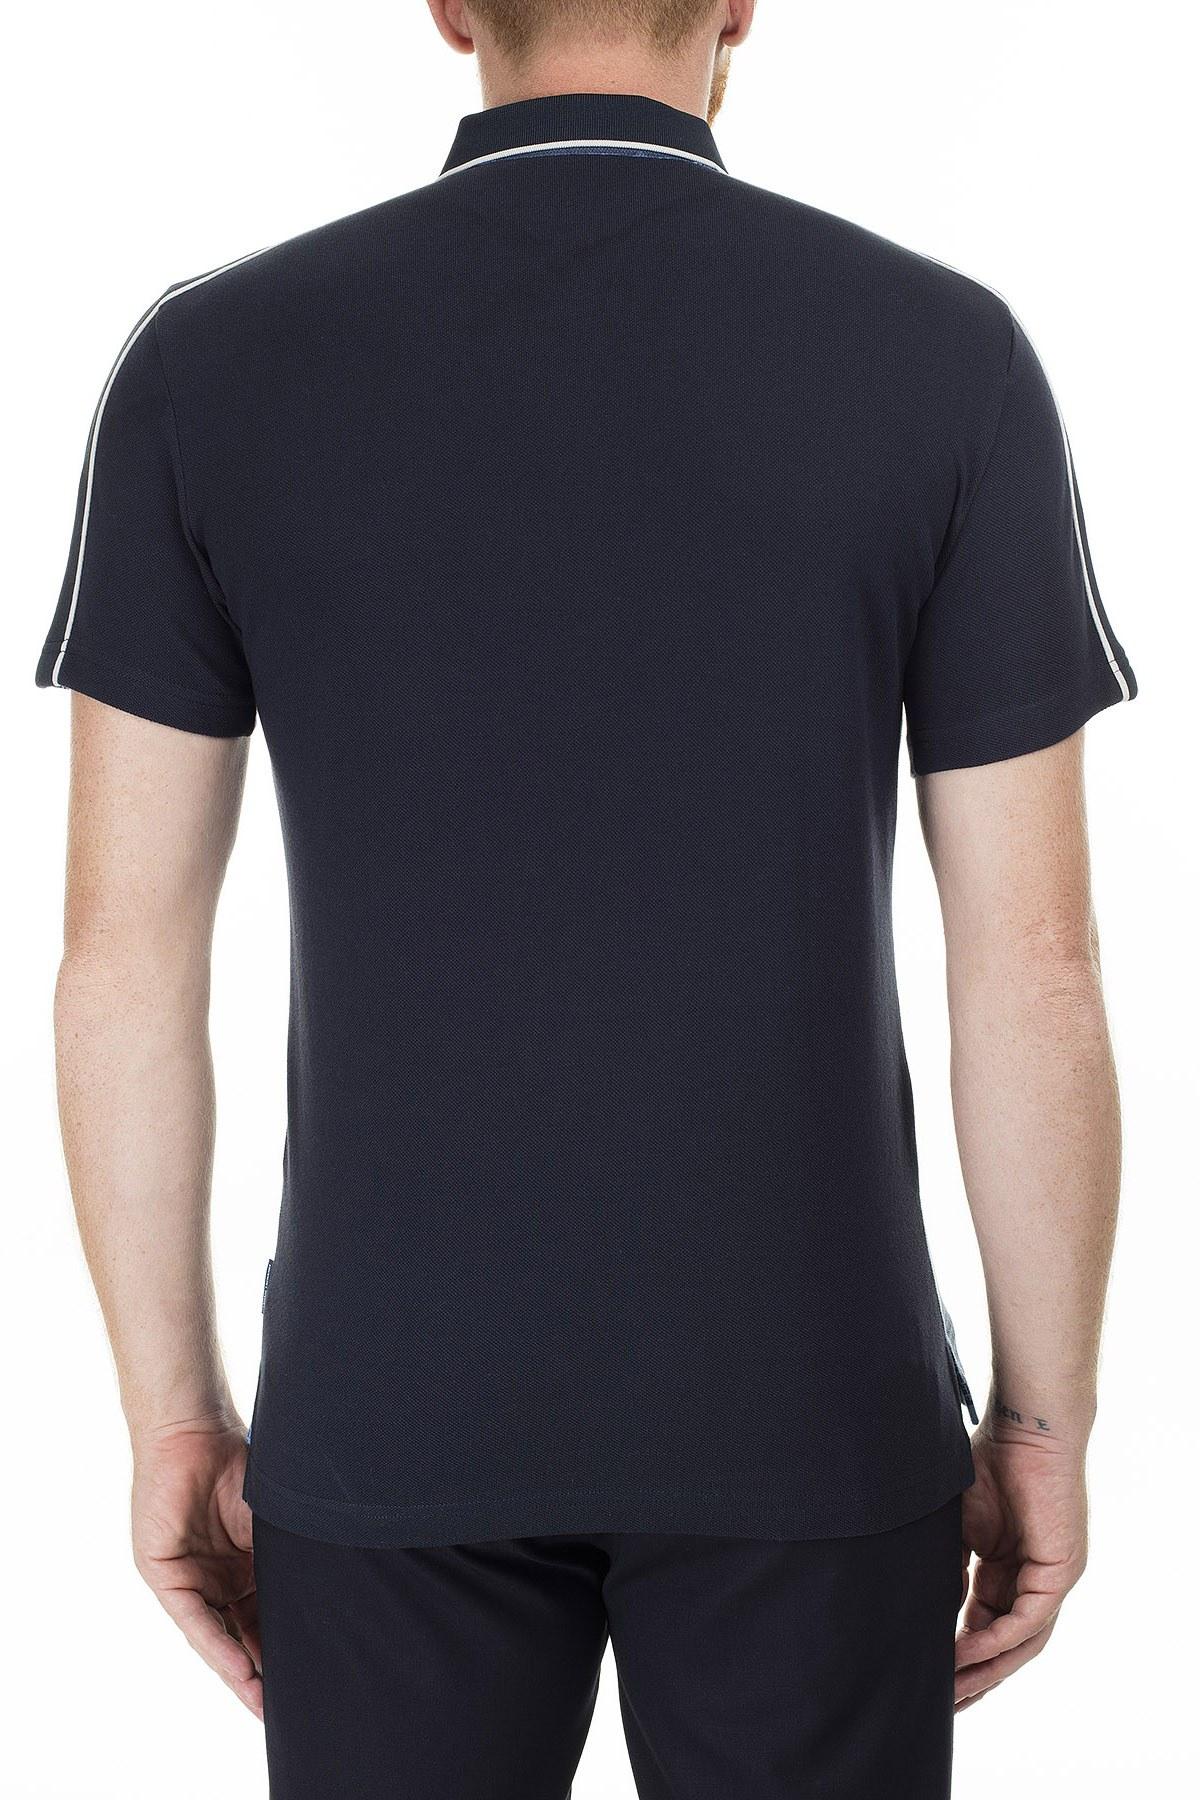 Armani Exchange Desenli Regular Fit T Shirt Erkek Polo 3HZFGC ZJM5Z 9507 SAKS